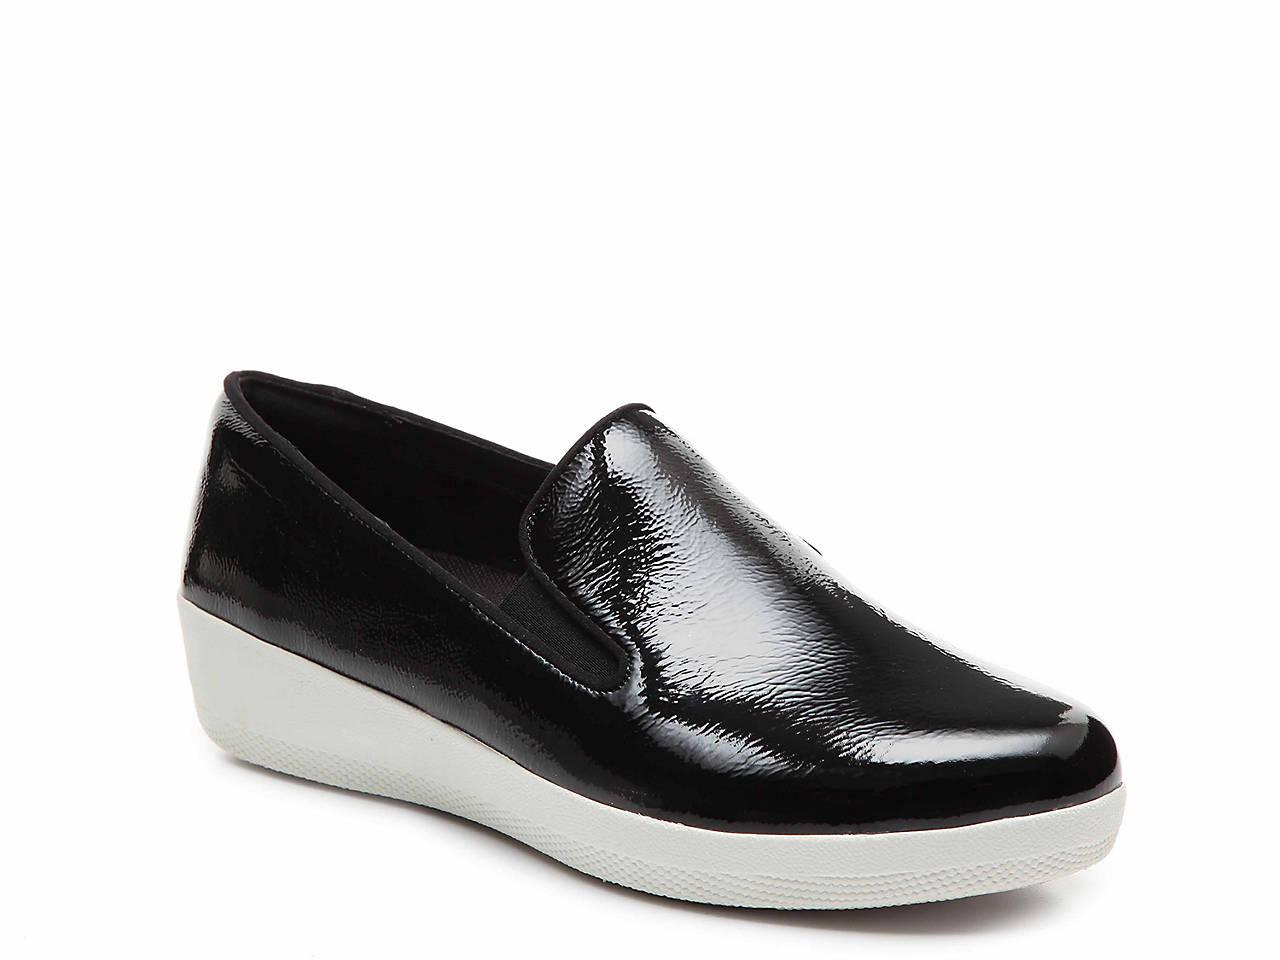 1d3edd1b4171 FitFlop Superskate Wedge Slip-On Women s Shoes